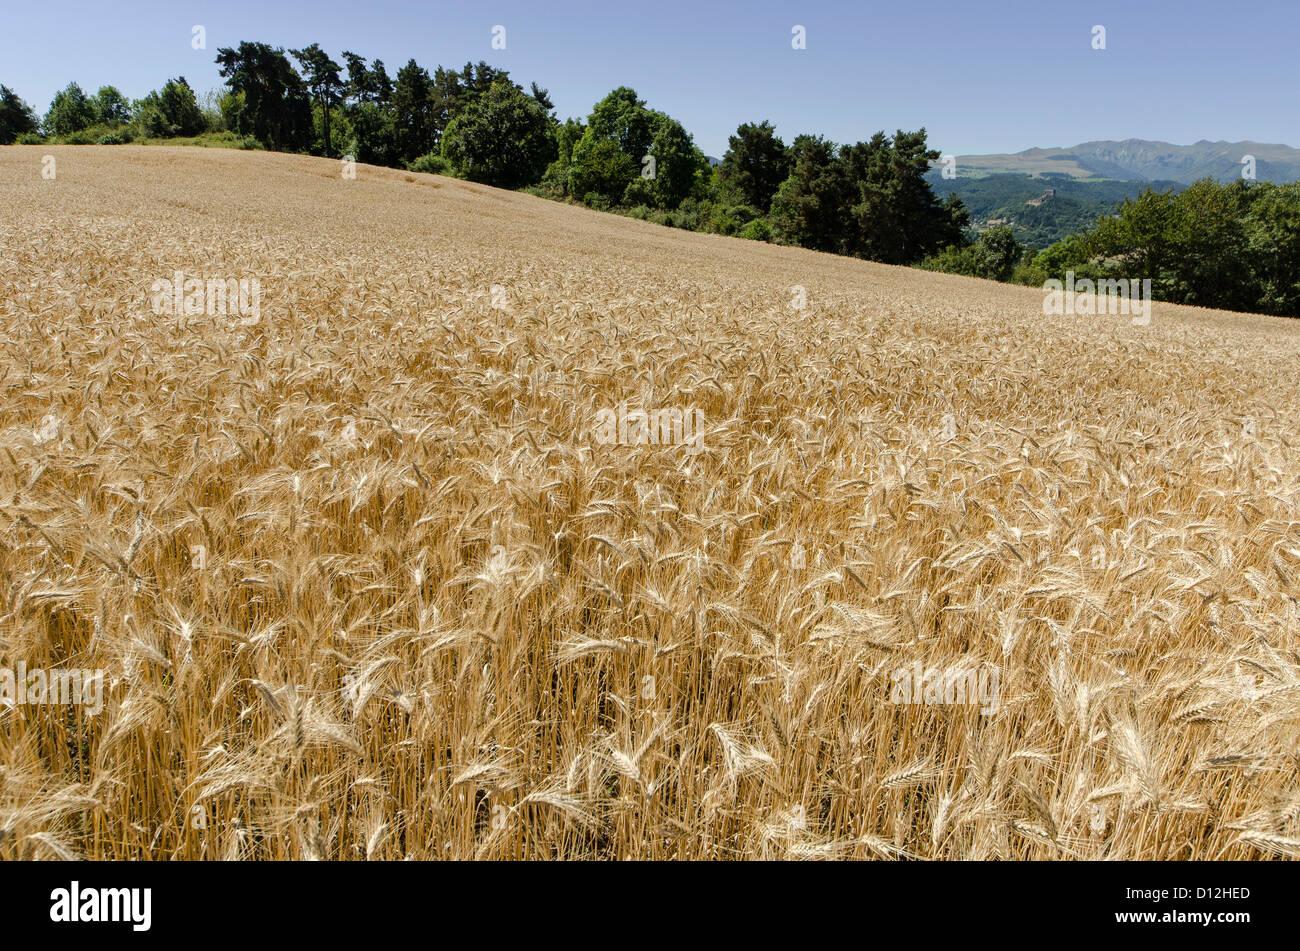 Paysage rural Banque D'Images